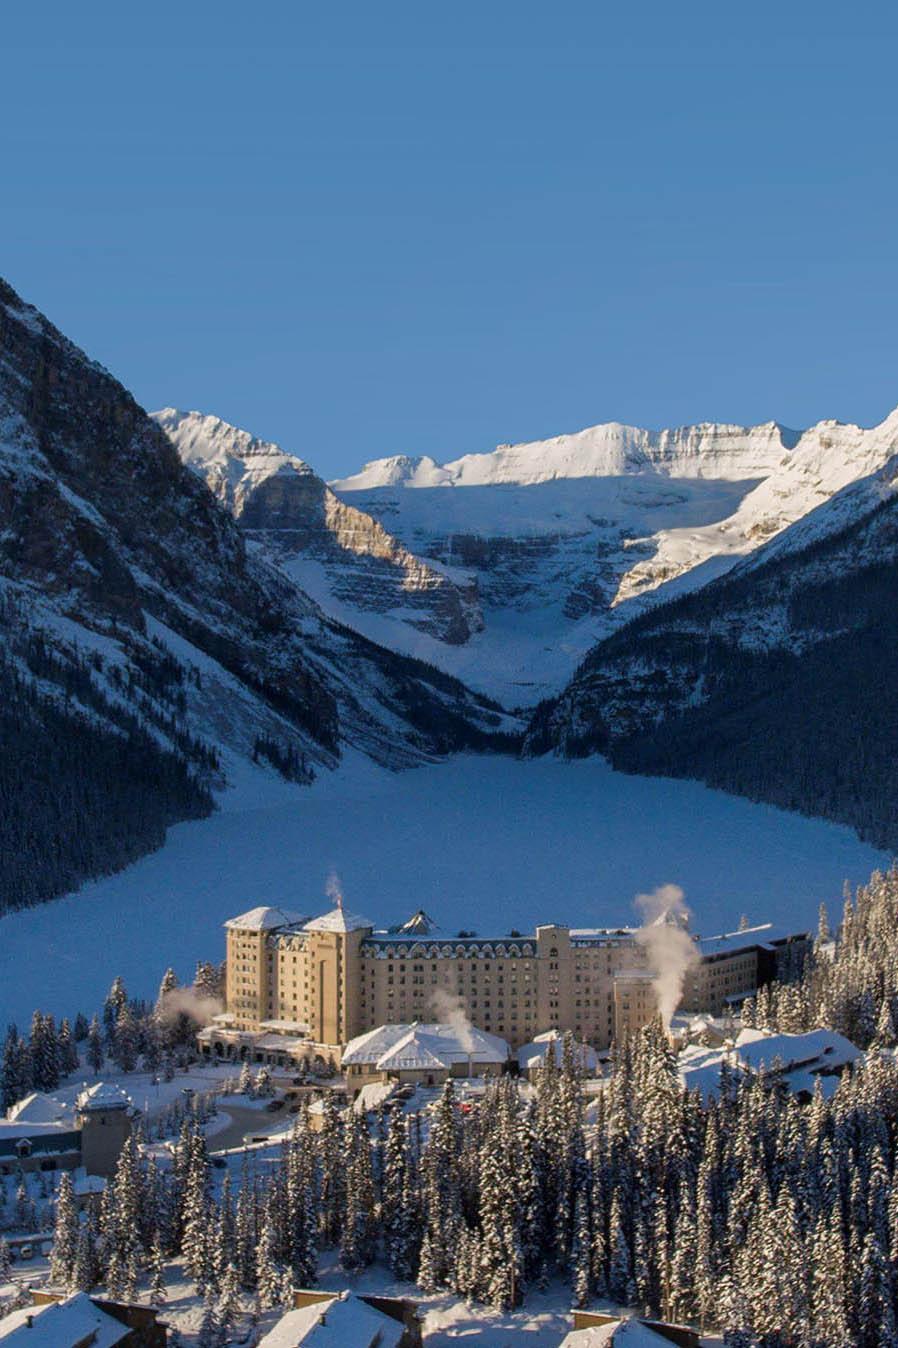 Fairmont Banff Springs Hotel & Fairmont Chateau Lake Louise Luxury Vacation